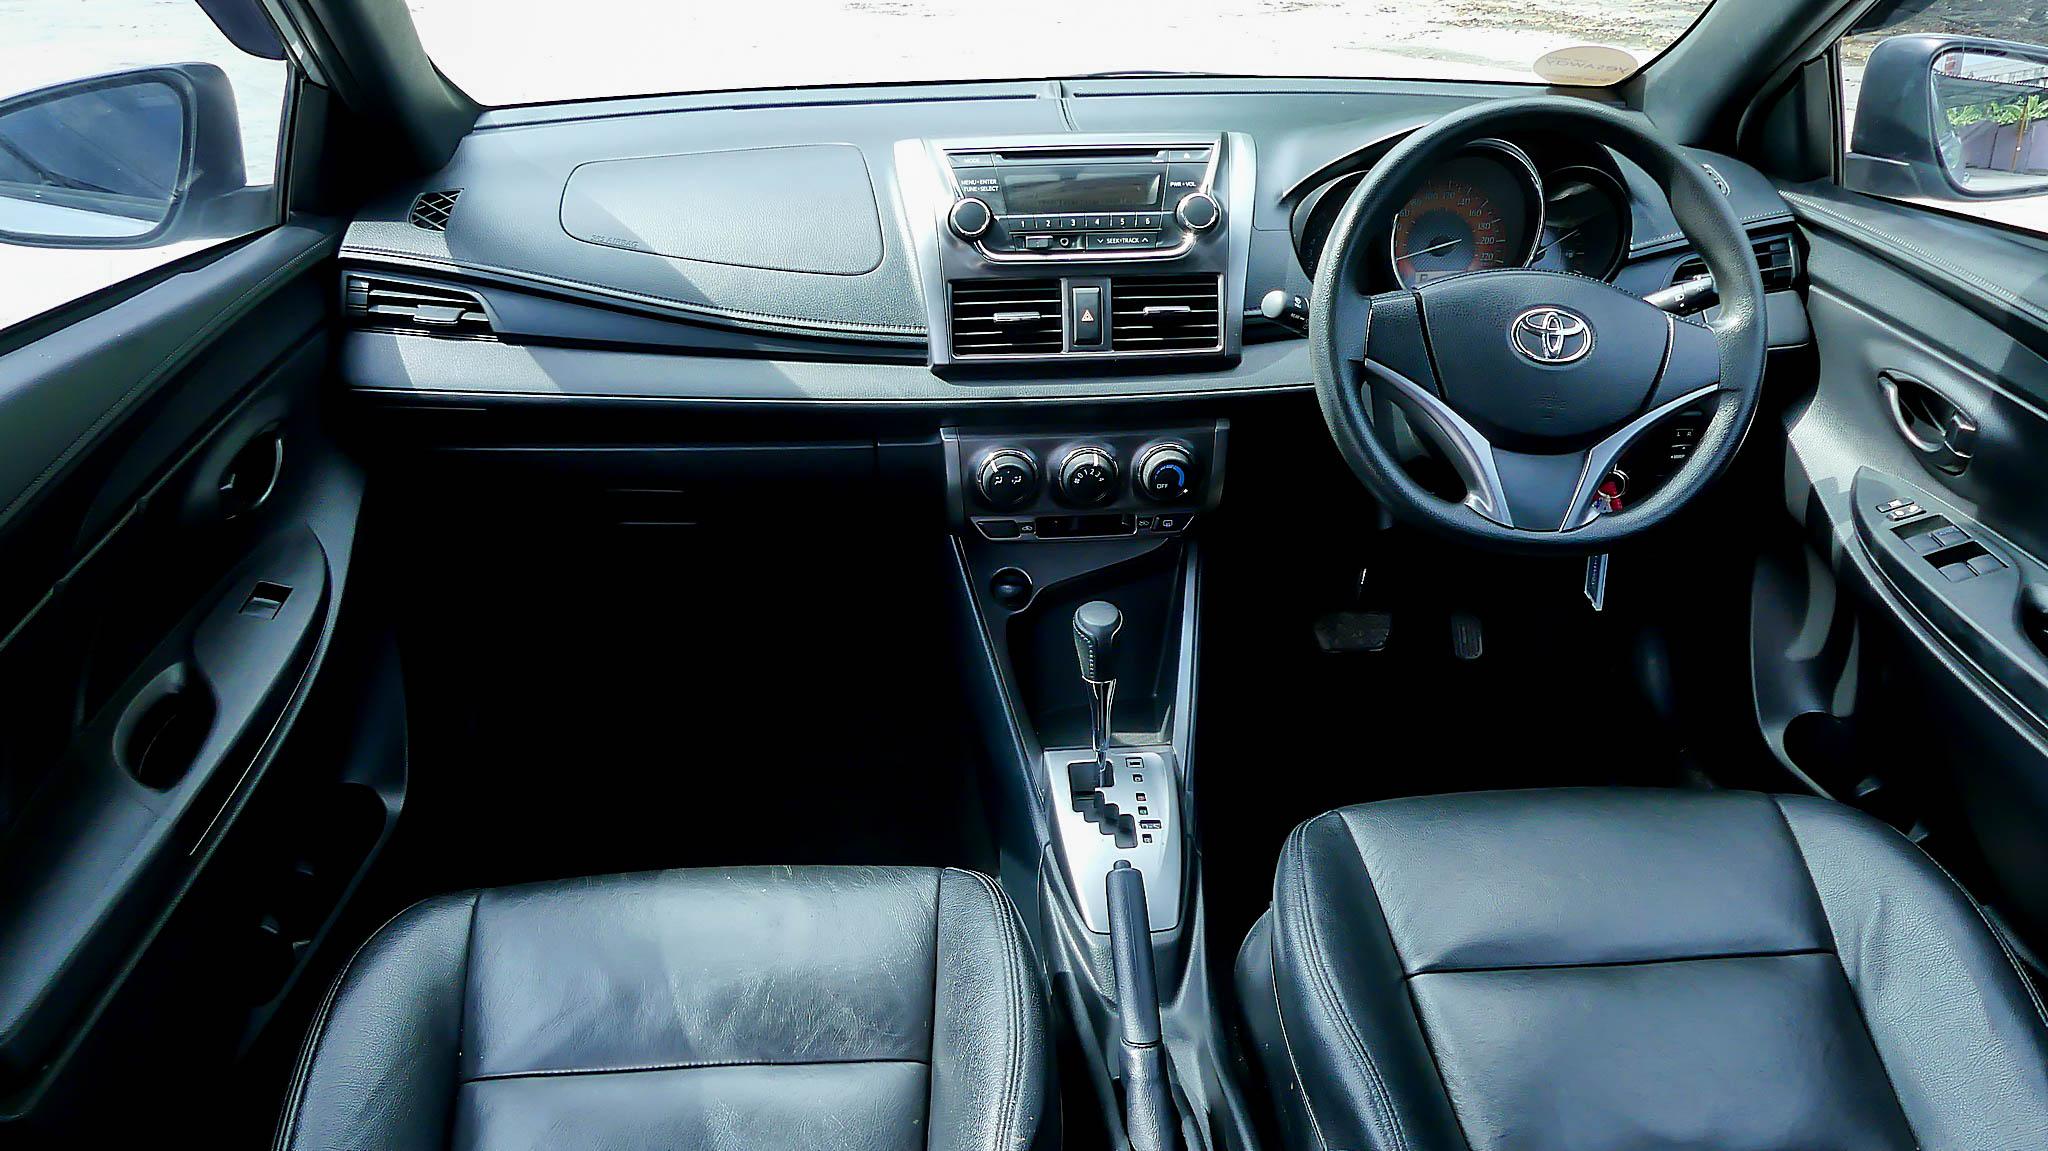 Toyota Yaris 1.2 E / AT 2014